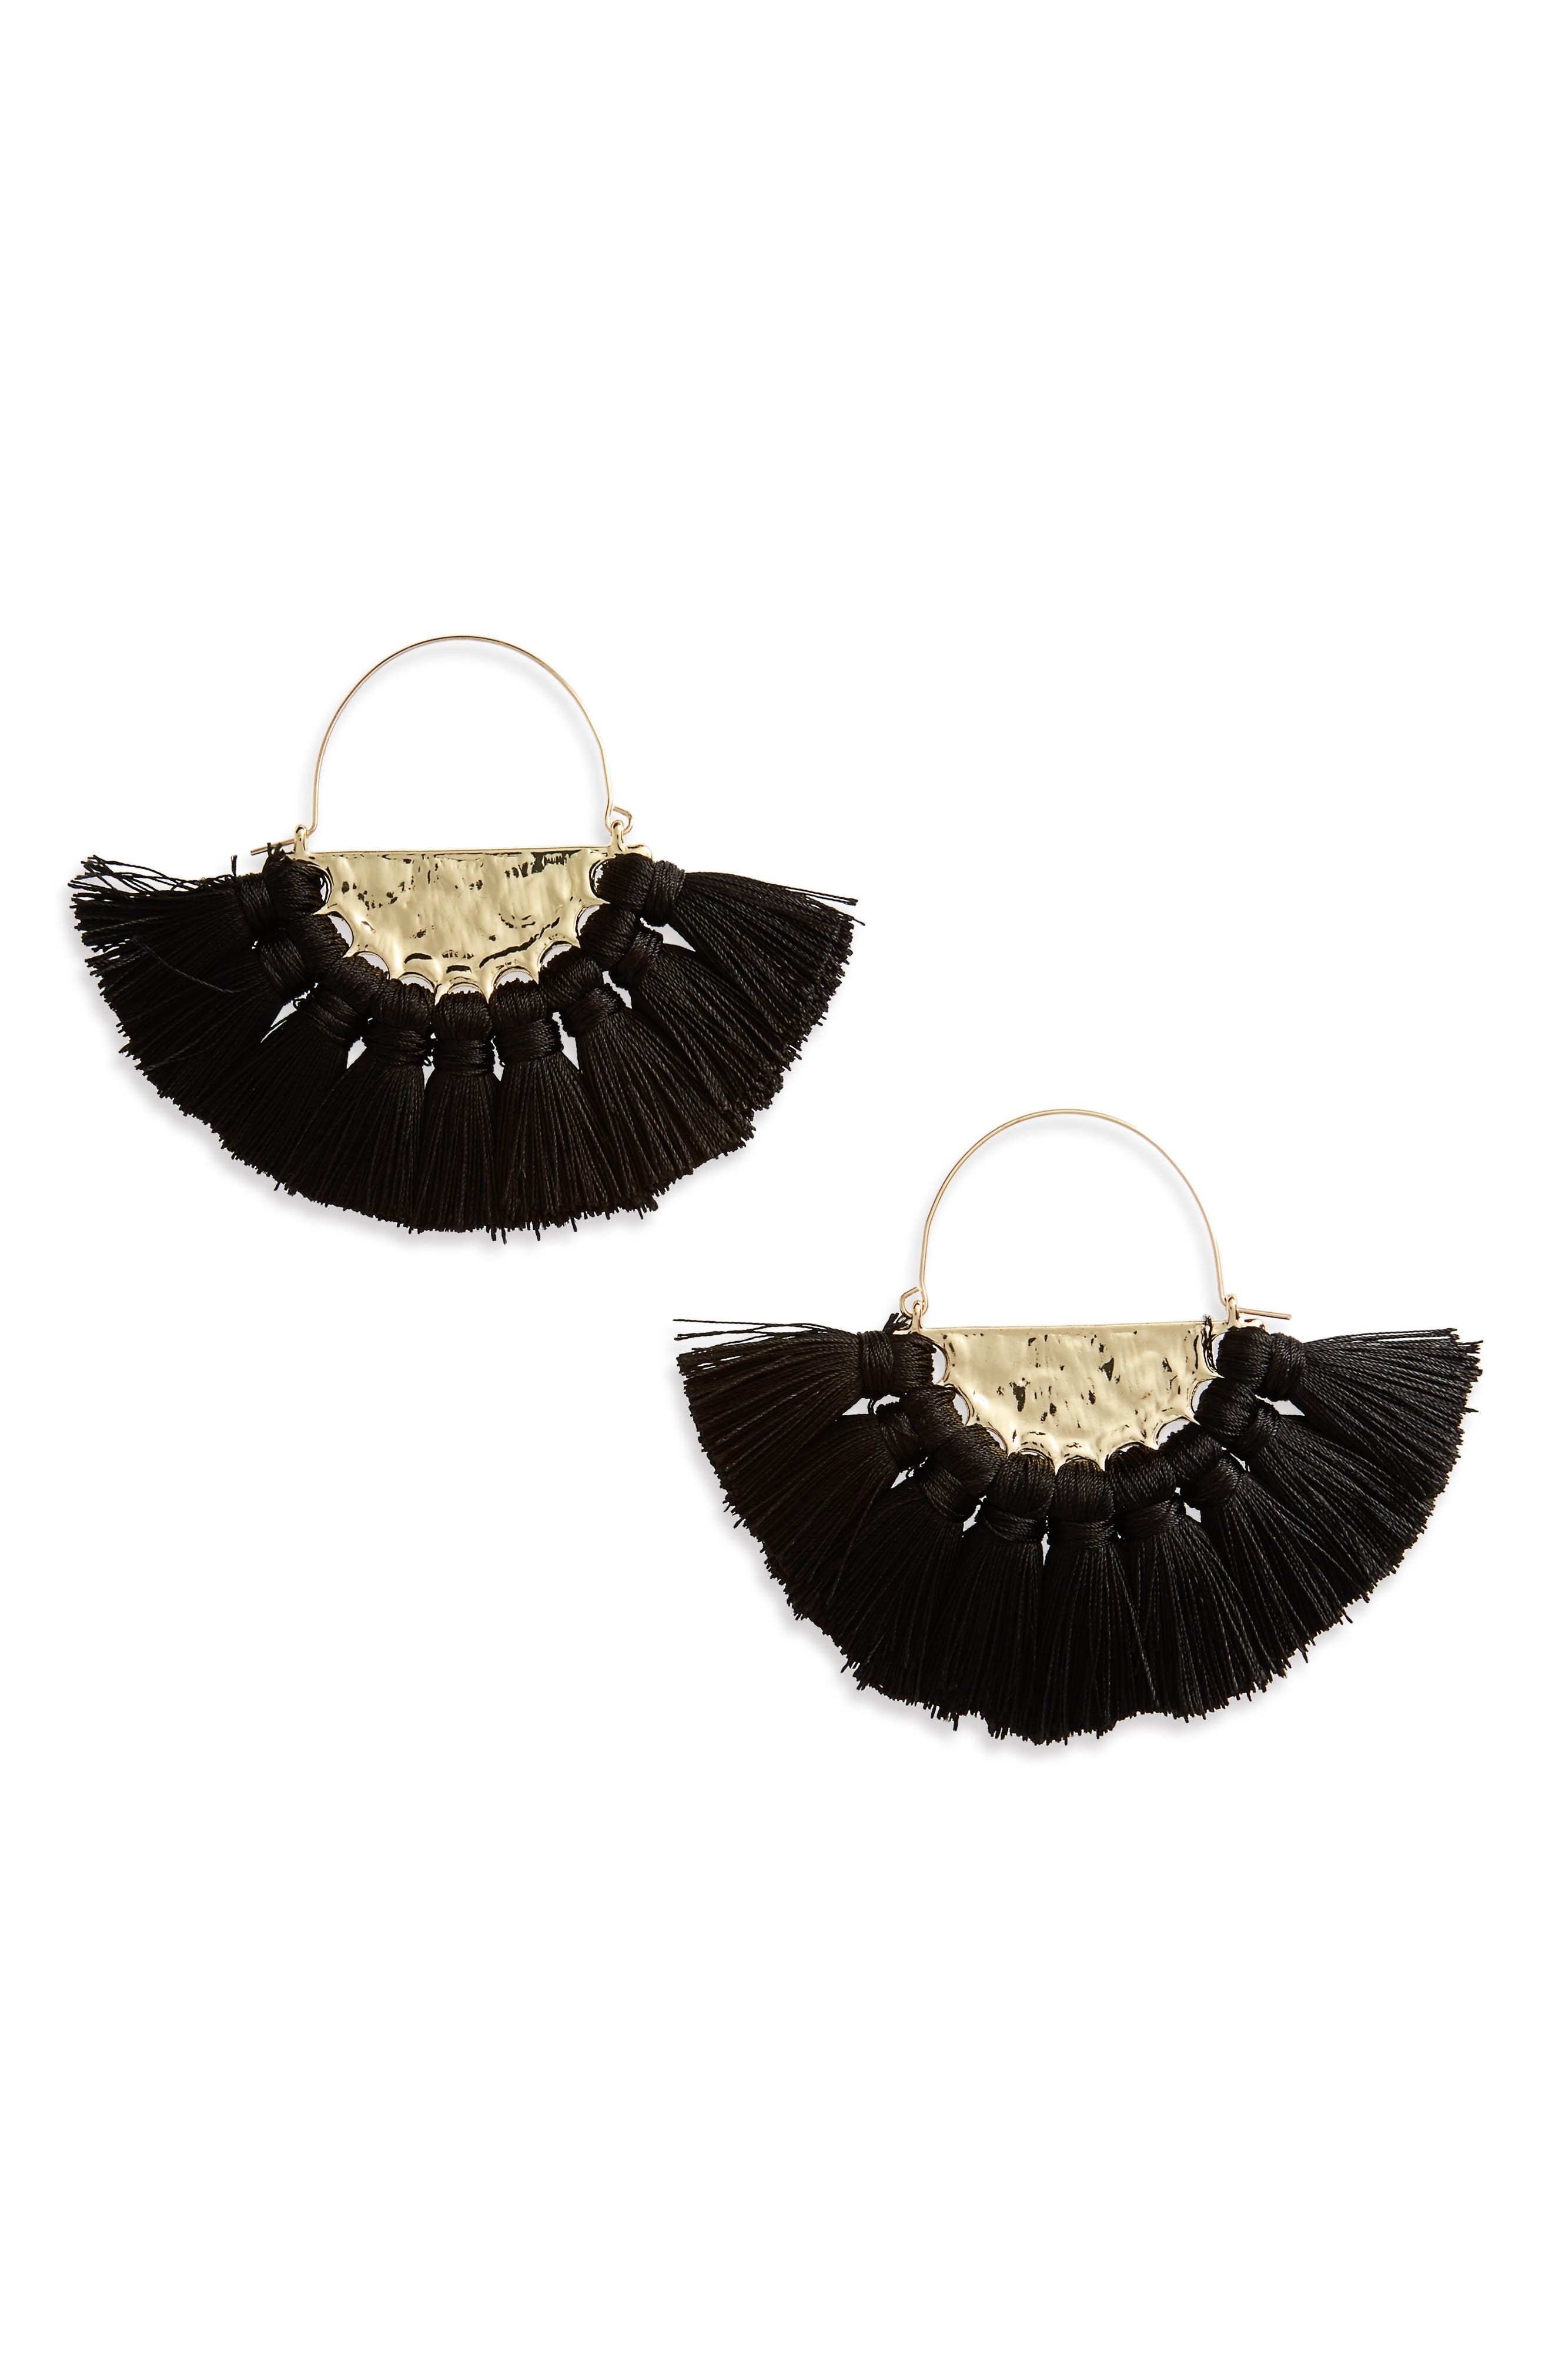 Alternate Image 1 Selected - BP. Oversize Fan Earrings